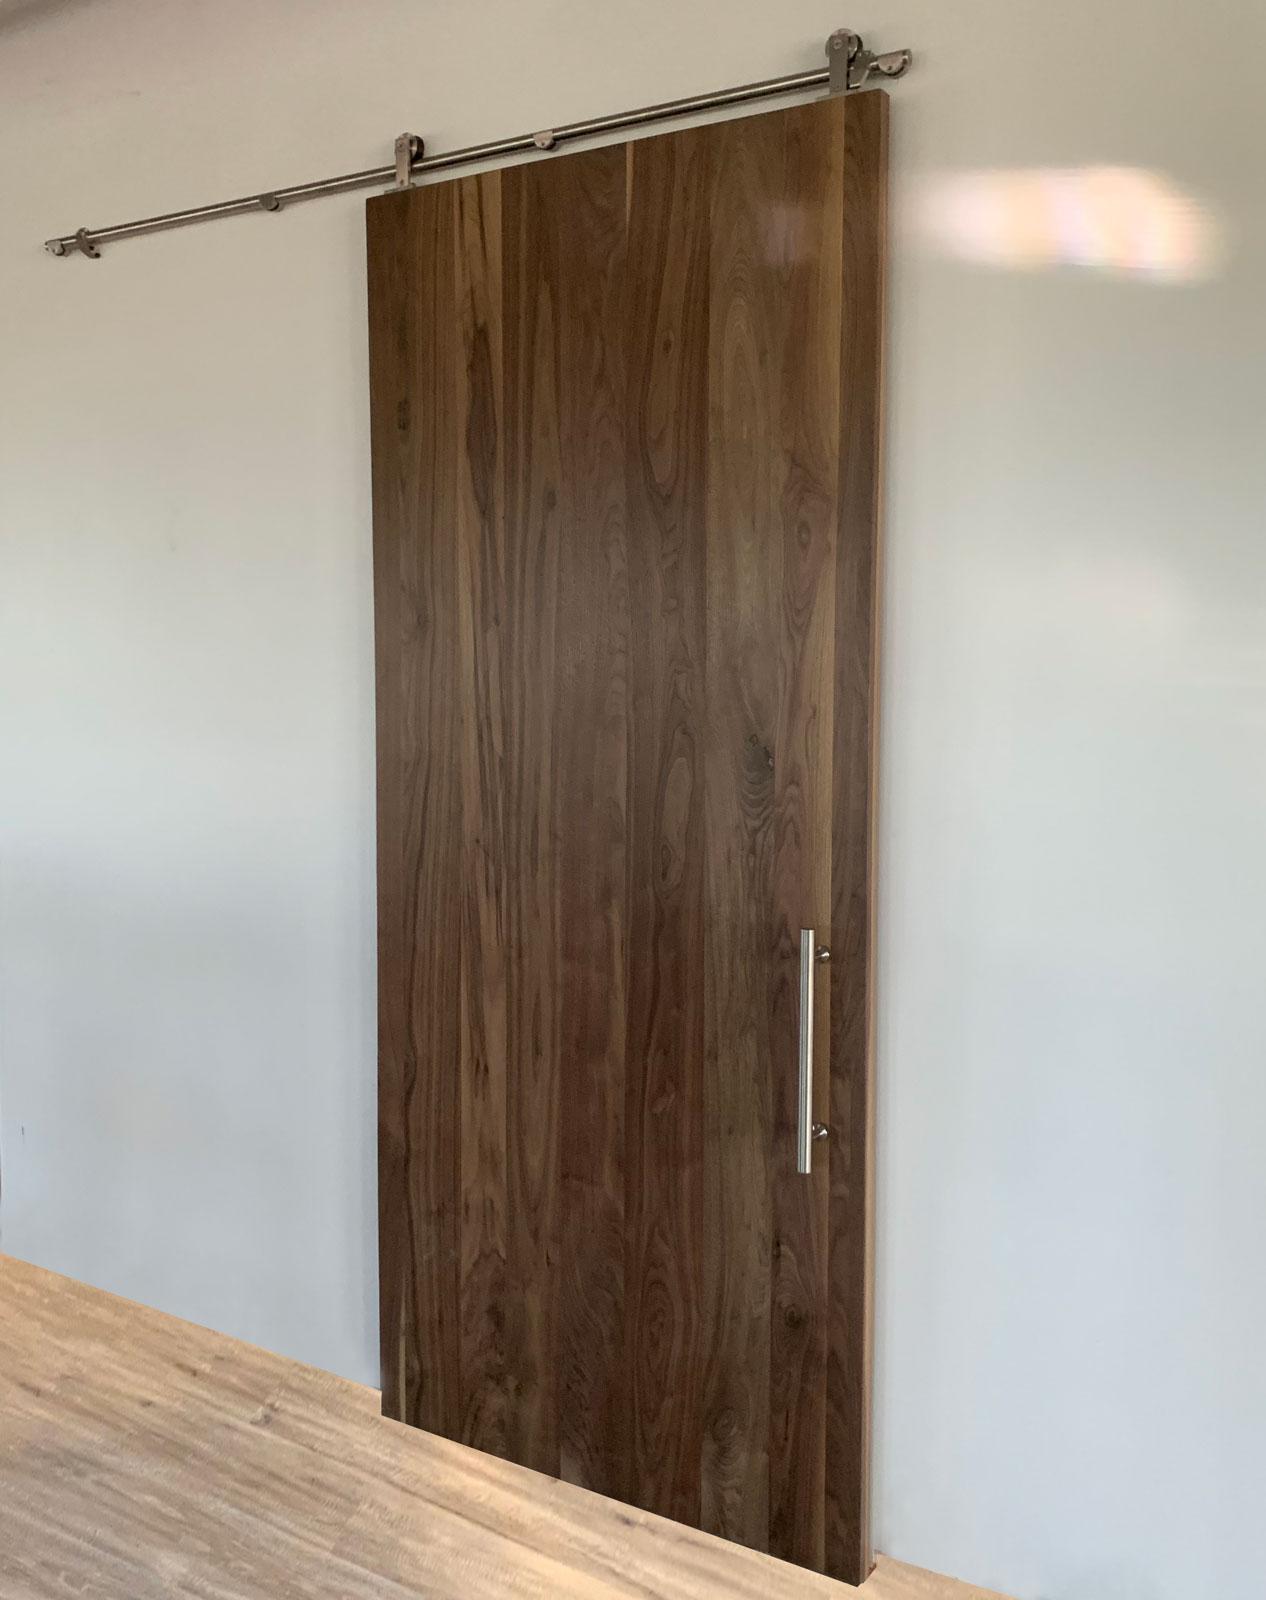 walnut barn door with stainless steel hardware